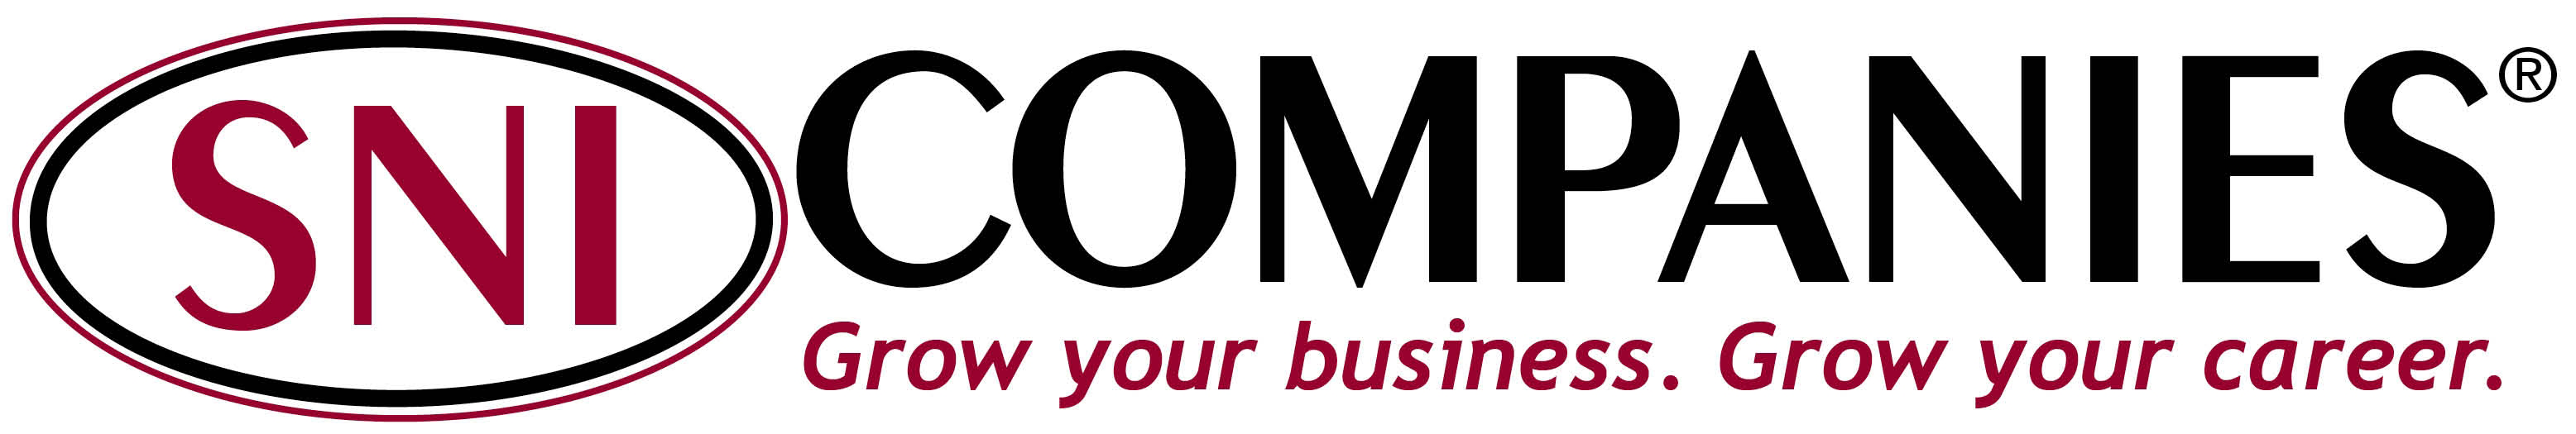 SNI Companies